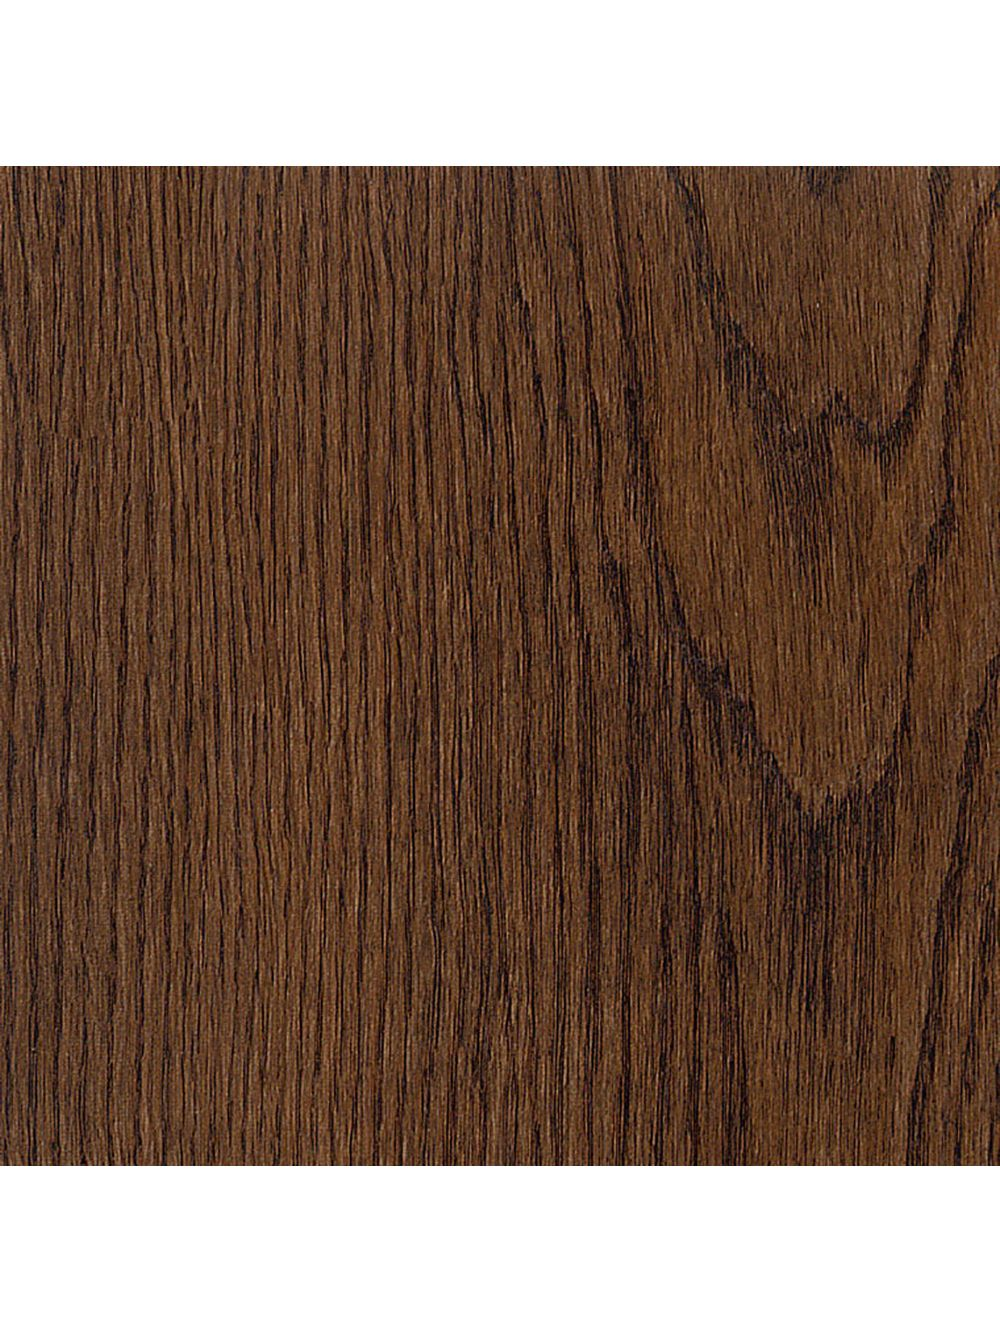 Amtico Amtico Form Natural Wood Grain Flooring